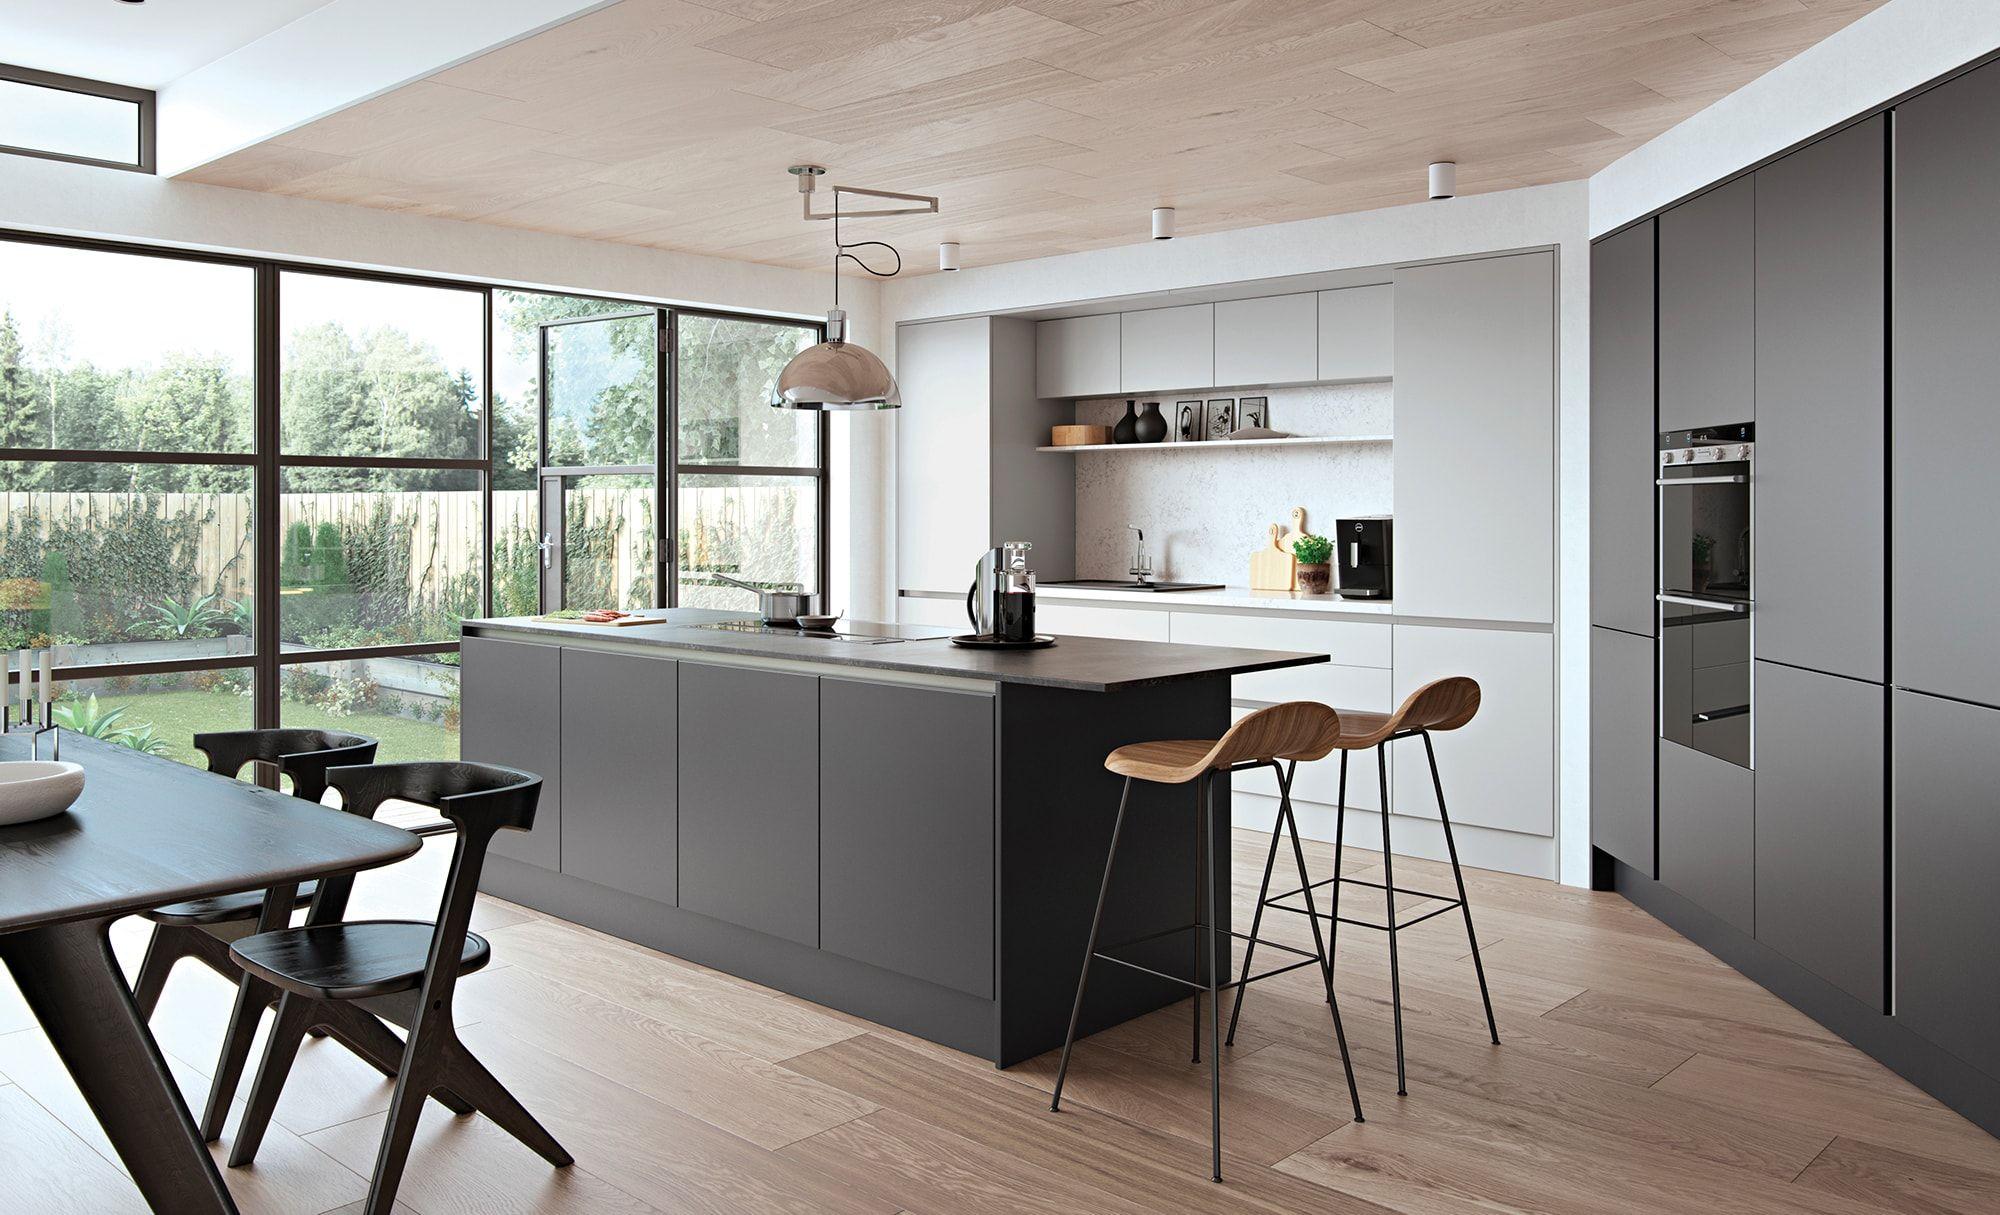 18 Stunning Ideas Of Grey Kitchen Cabinets Contemporary Kitchen Cabinets Modern Grey Kitchen Handleless Kitchen